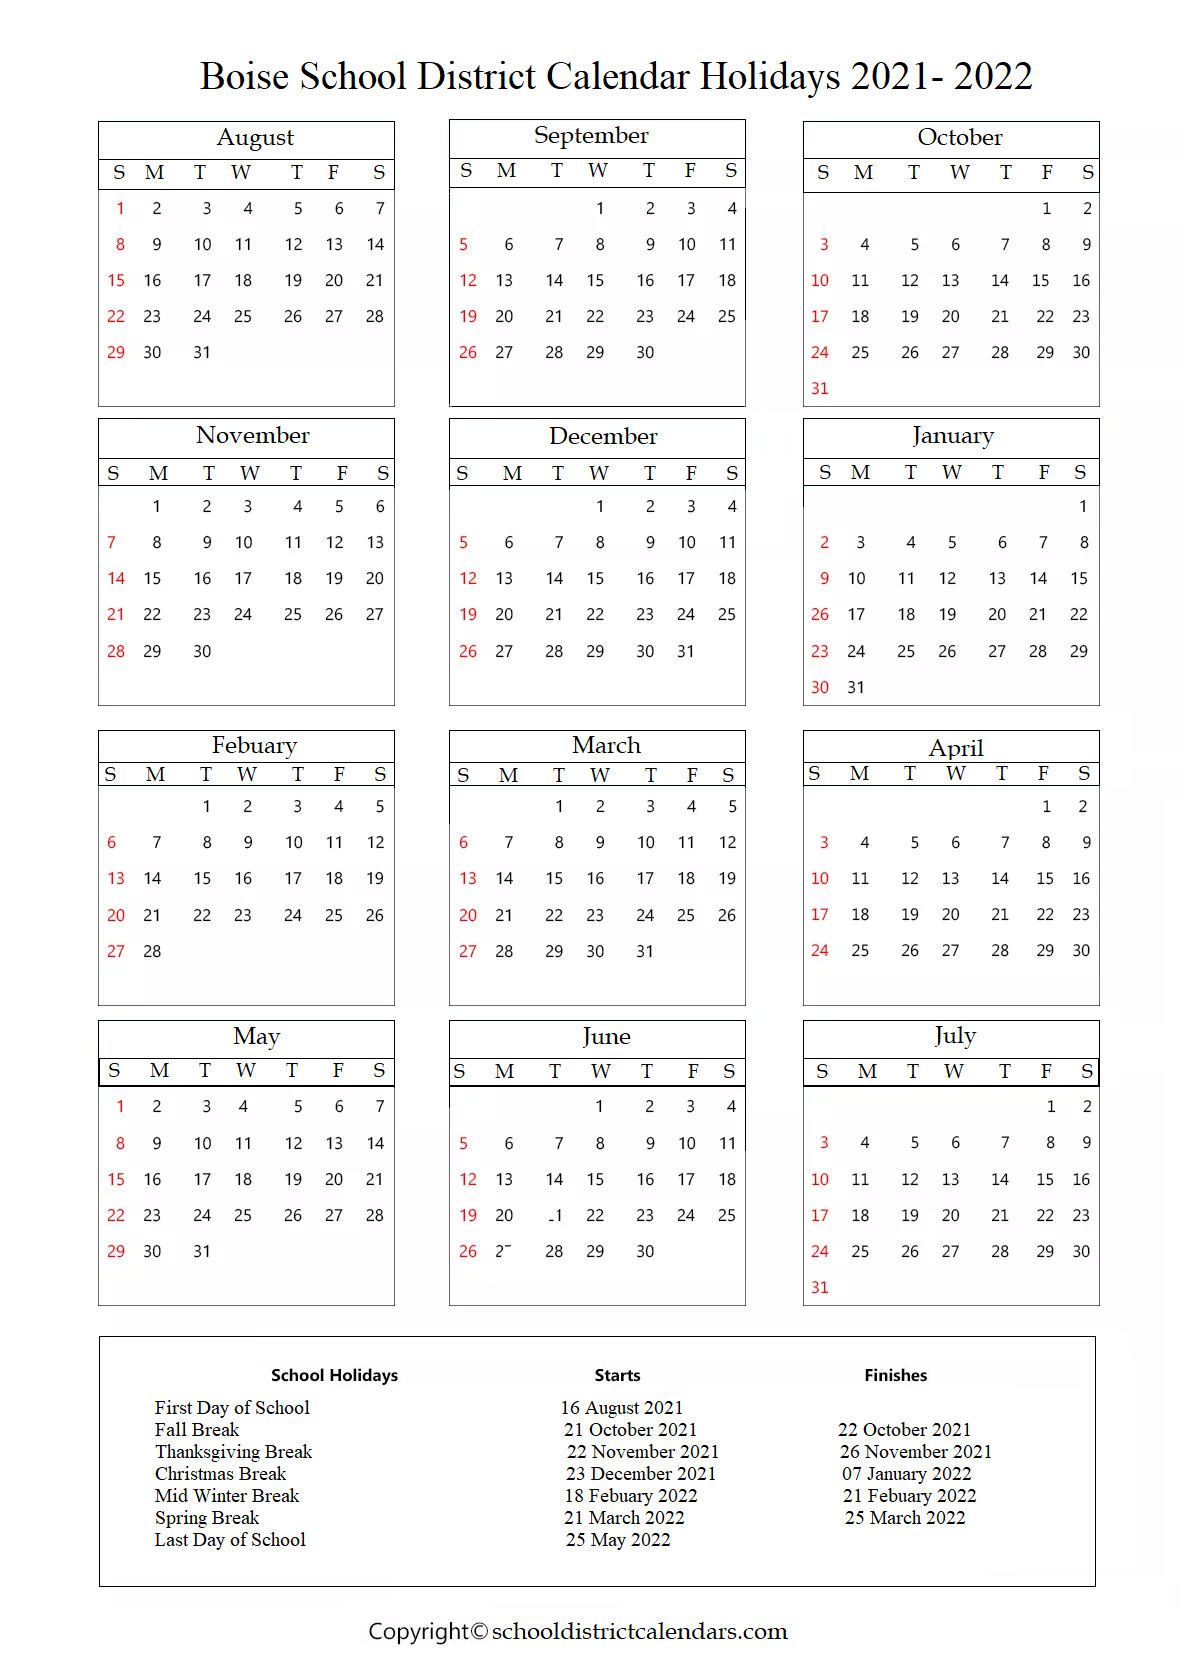 Boise School District, Idaho Calendar Holidays 2021-2022